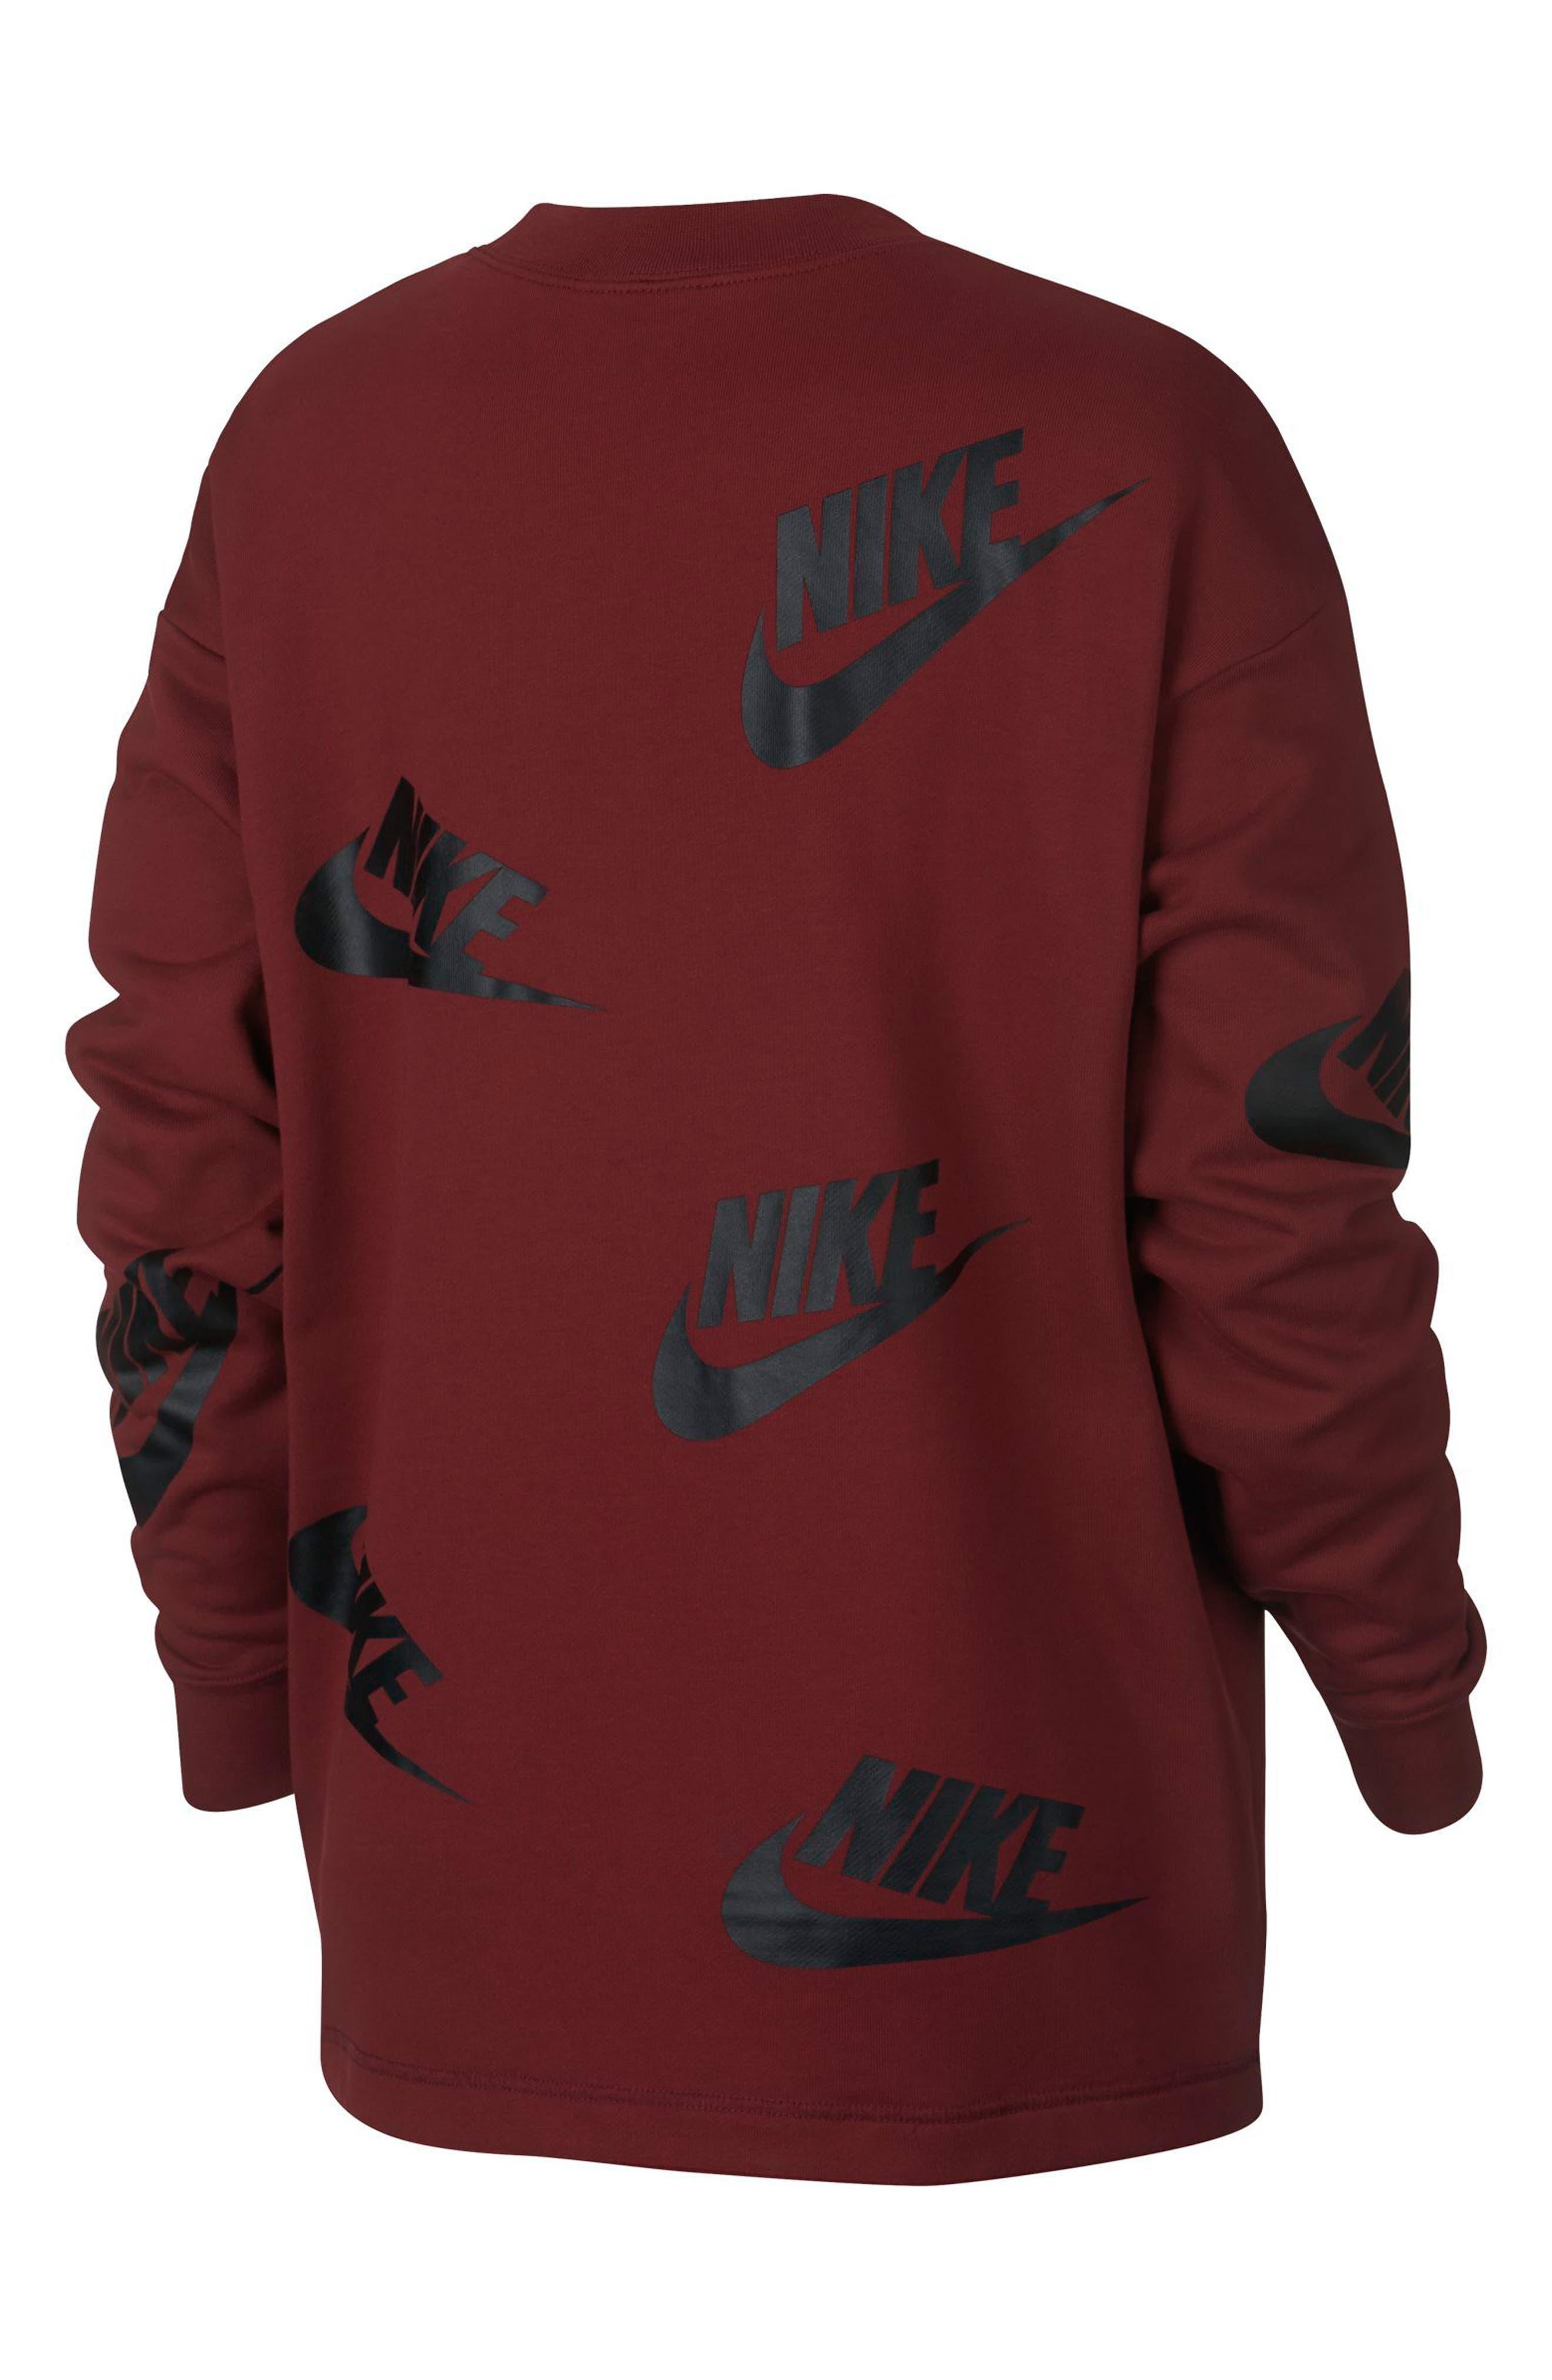 Sportswear Futura Women's Crewneck Sweatshirt,                             Alternate thumbnail 2, color,                             Team Red/ Black